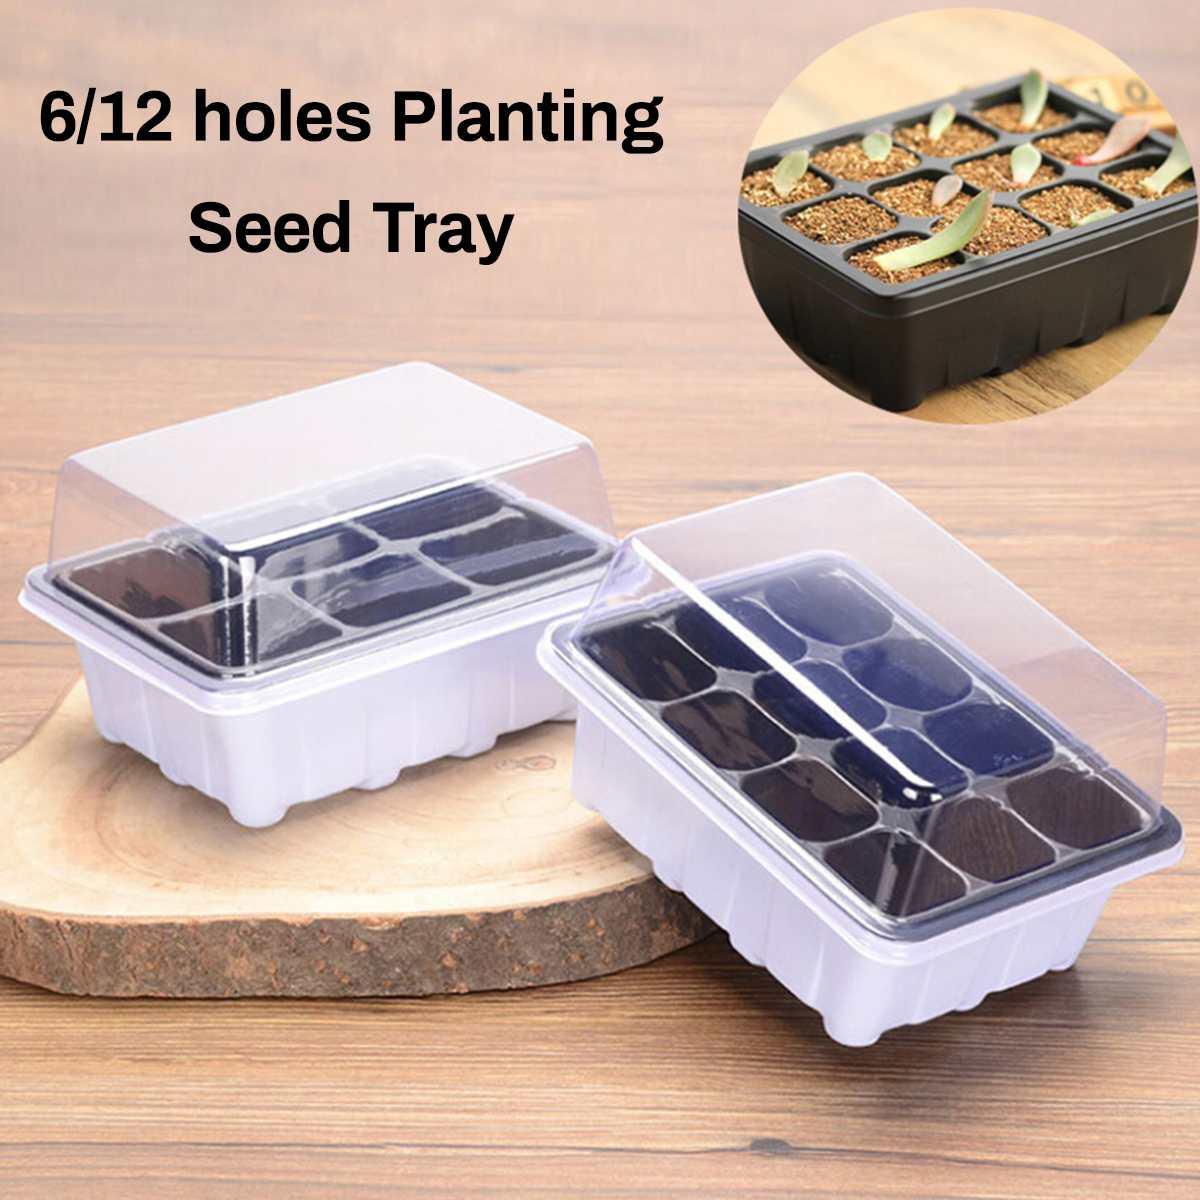 6/12 Holes Plastic Nursery Pots Seed Planting Tray Garden Plant Pots Germination Box Grow Box Gardening Supplies